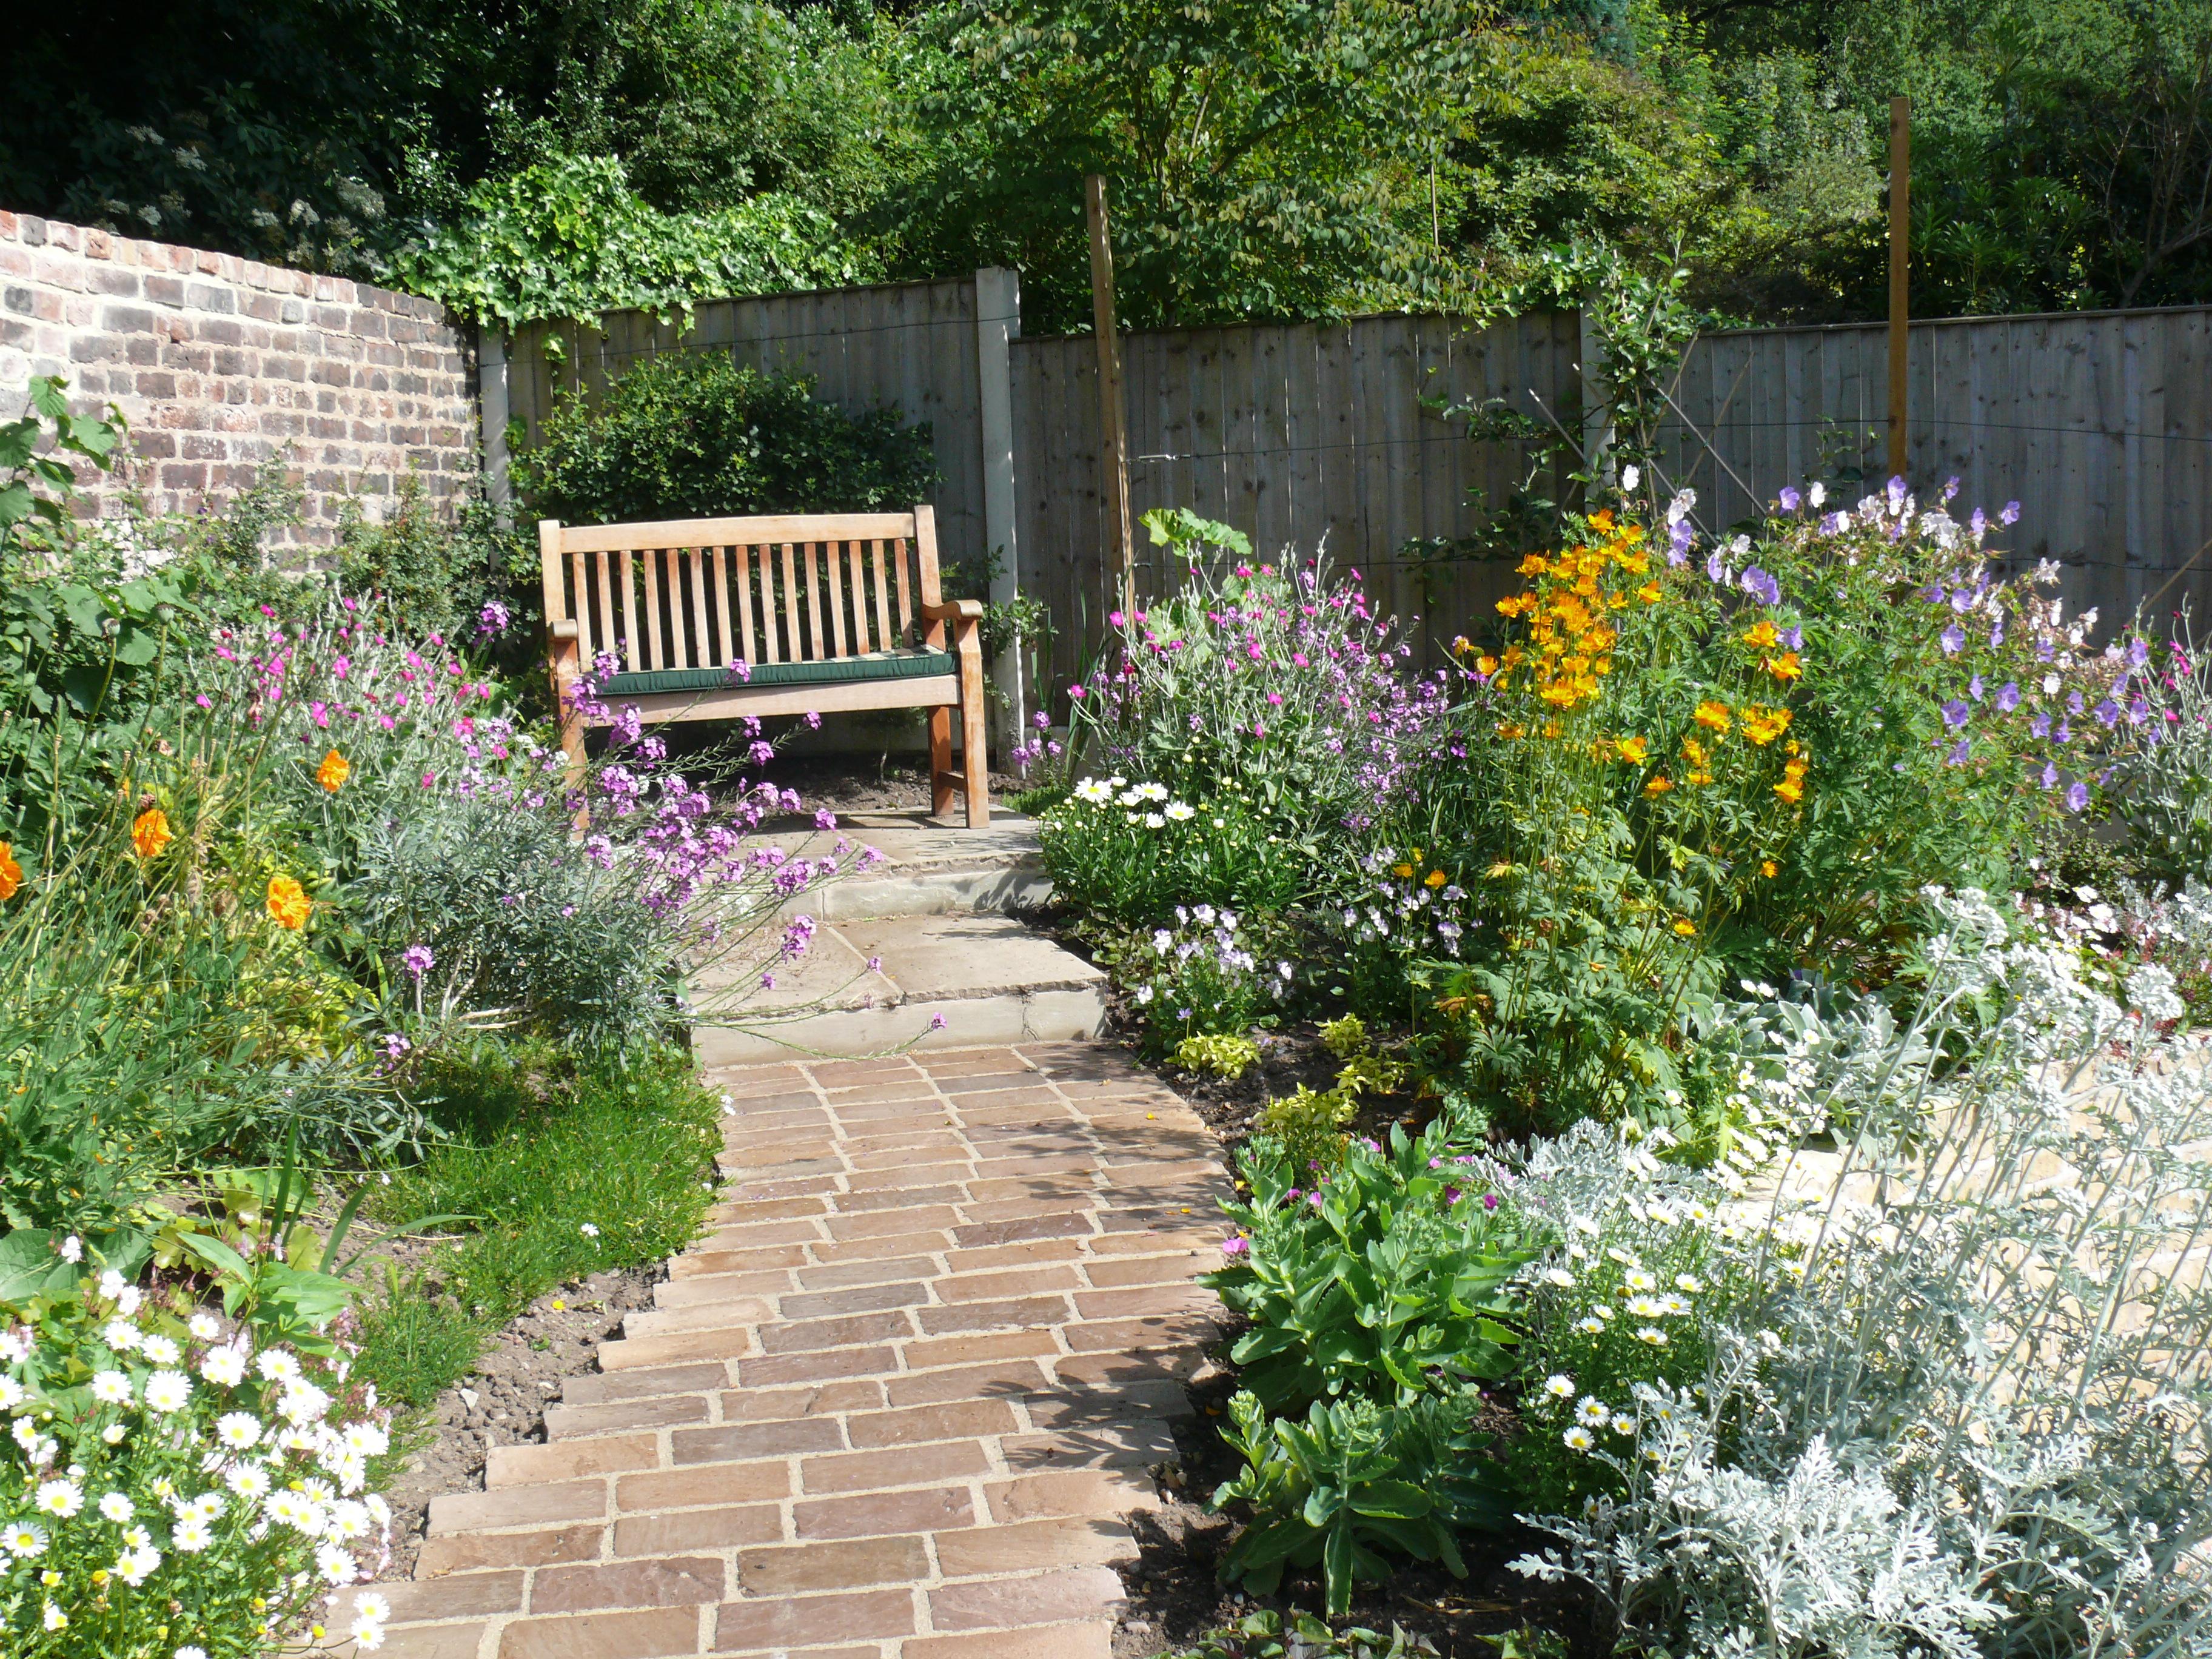 Wildflower Garden Care and Border Maintenance